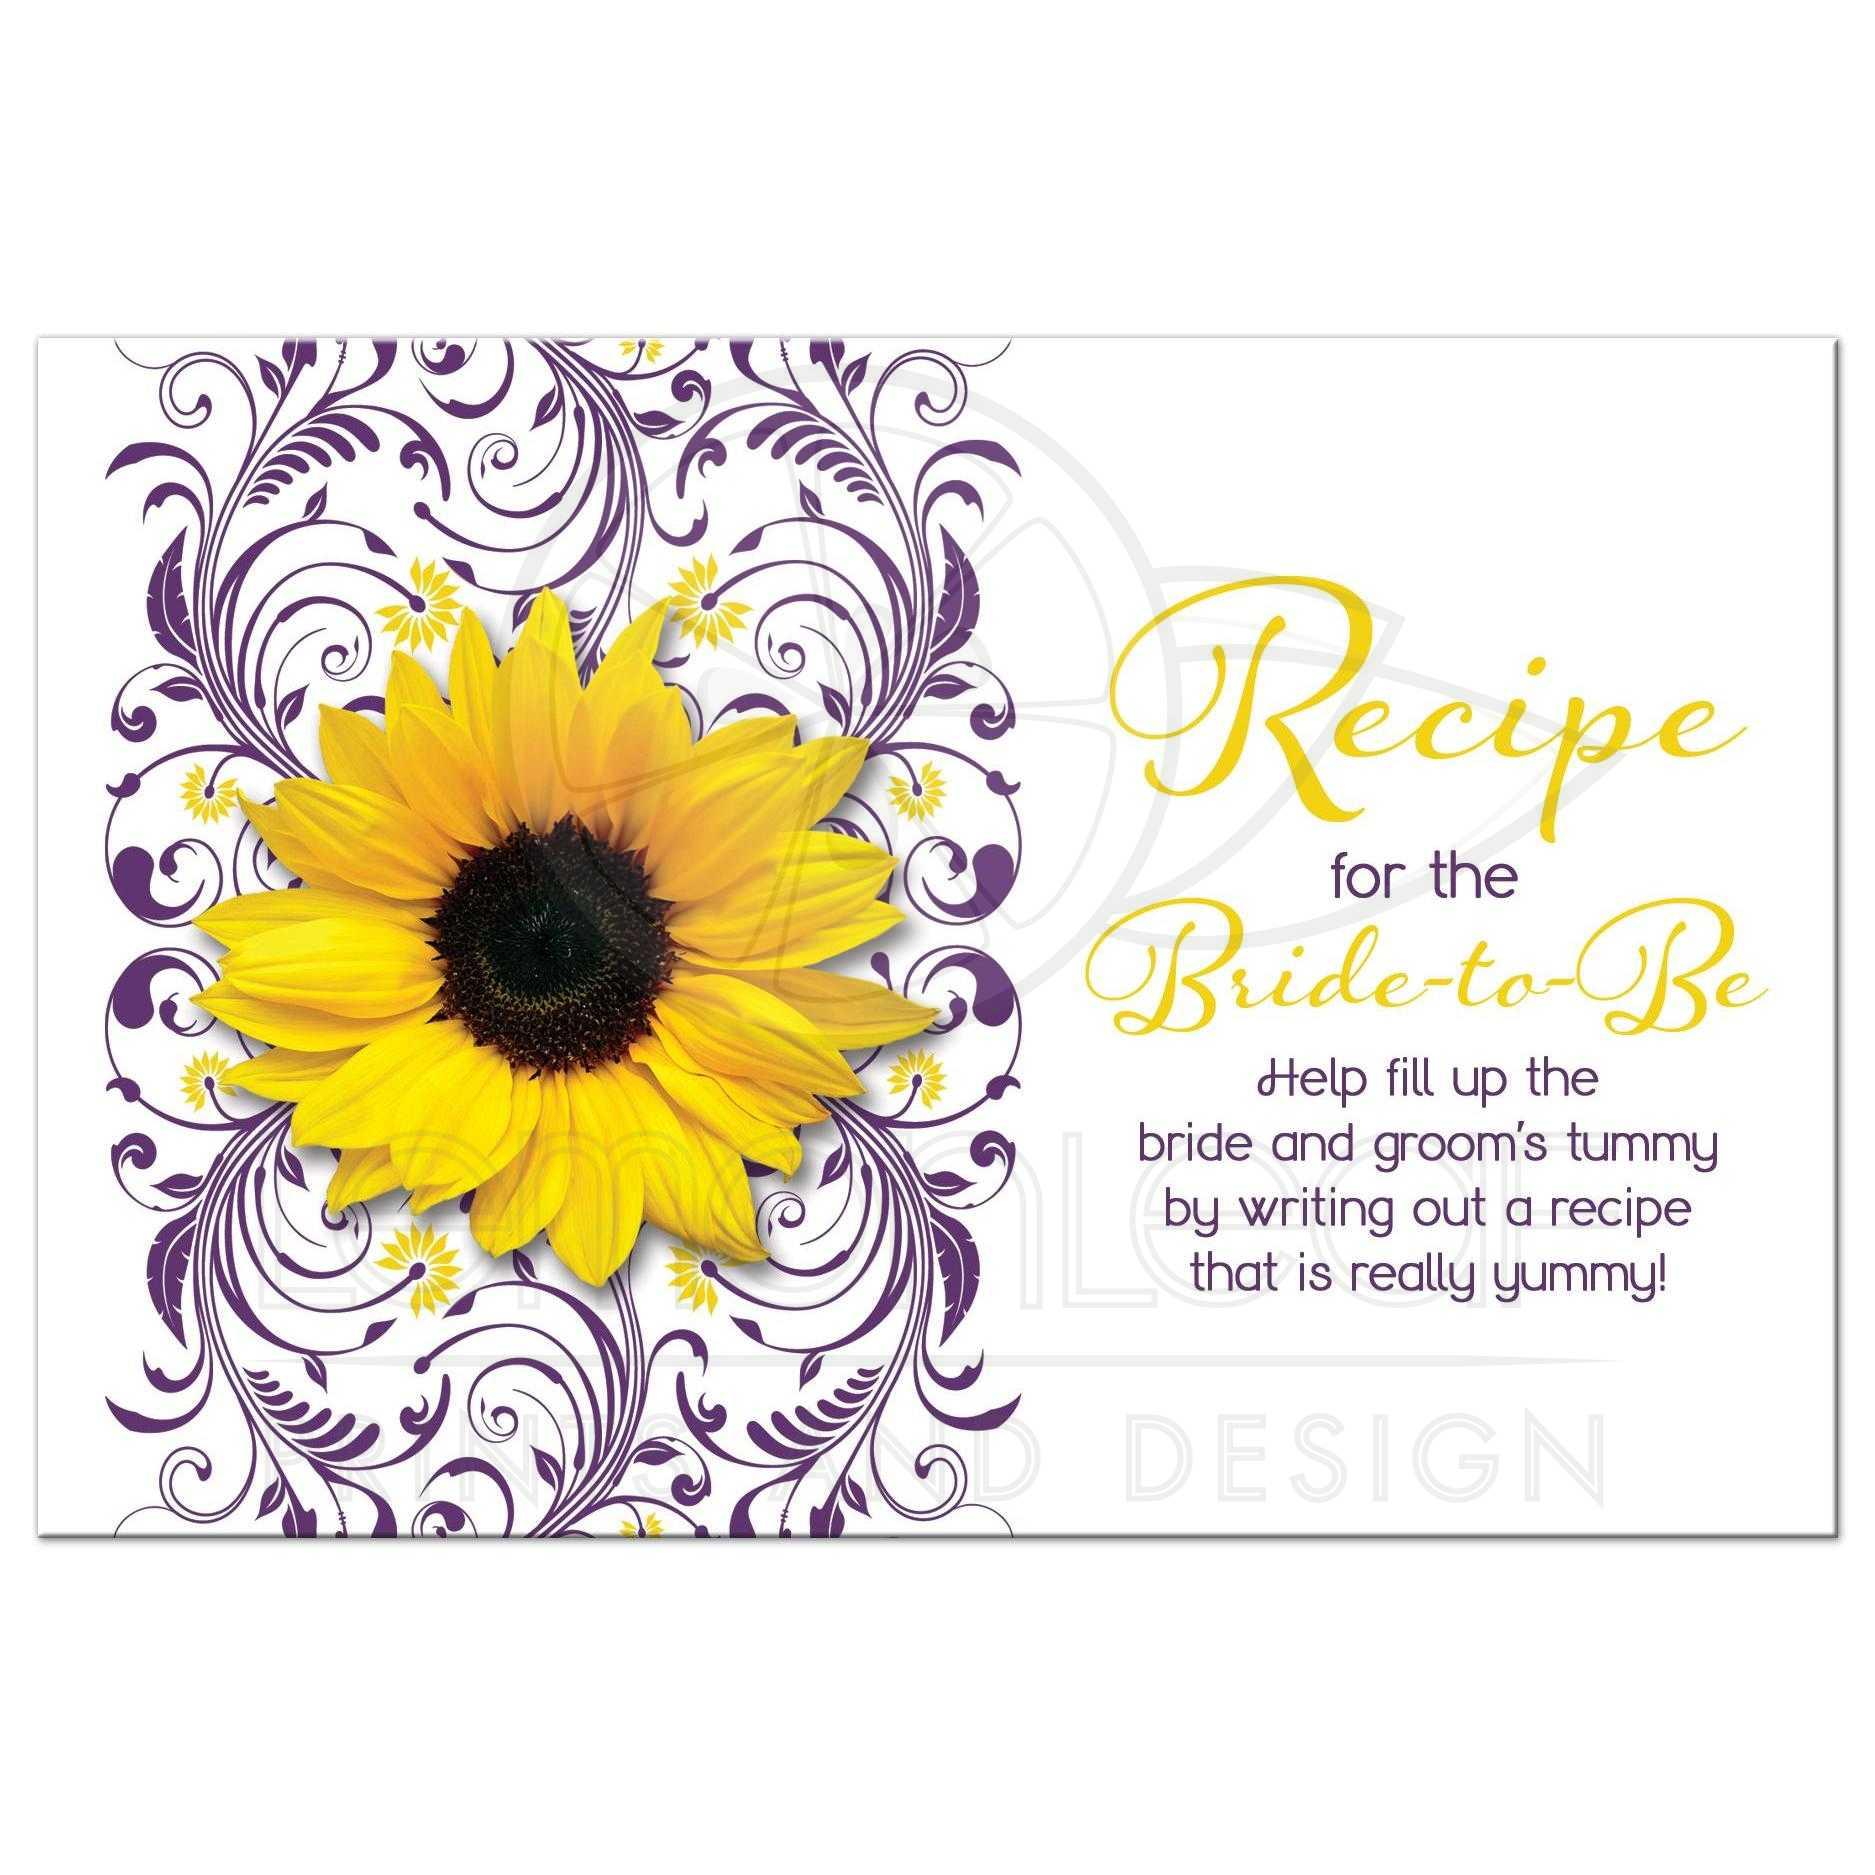 Bridal Shower Recipe Card | Sunflower Purple Floral